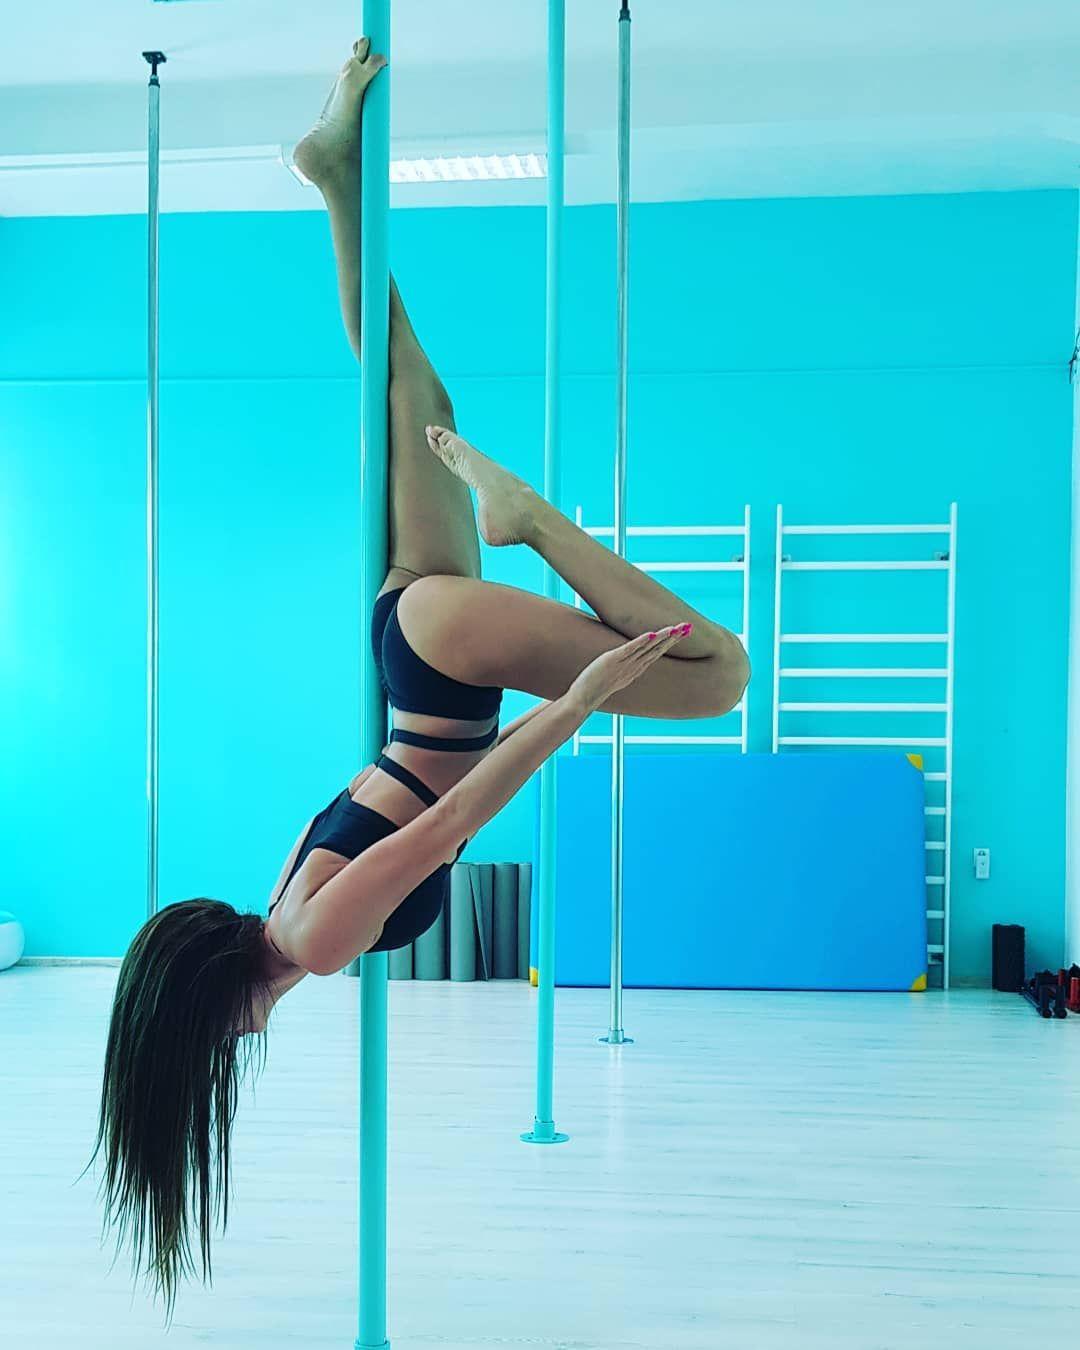 Poledancer Poledance Pd Poledancemotivation Fit Polelove Body Active Strong Drazek Rura Instapole Photo Pole Dance Moves Pole Dancing Pole Fitness